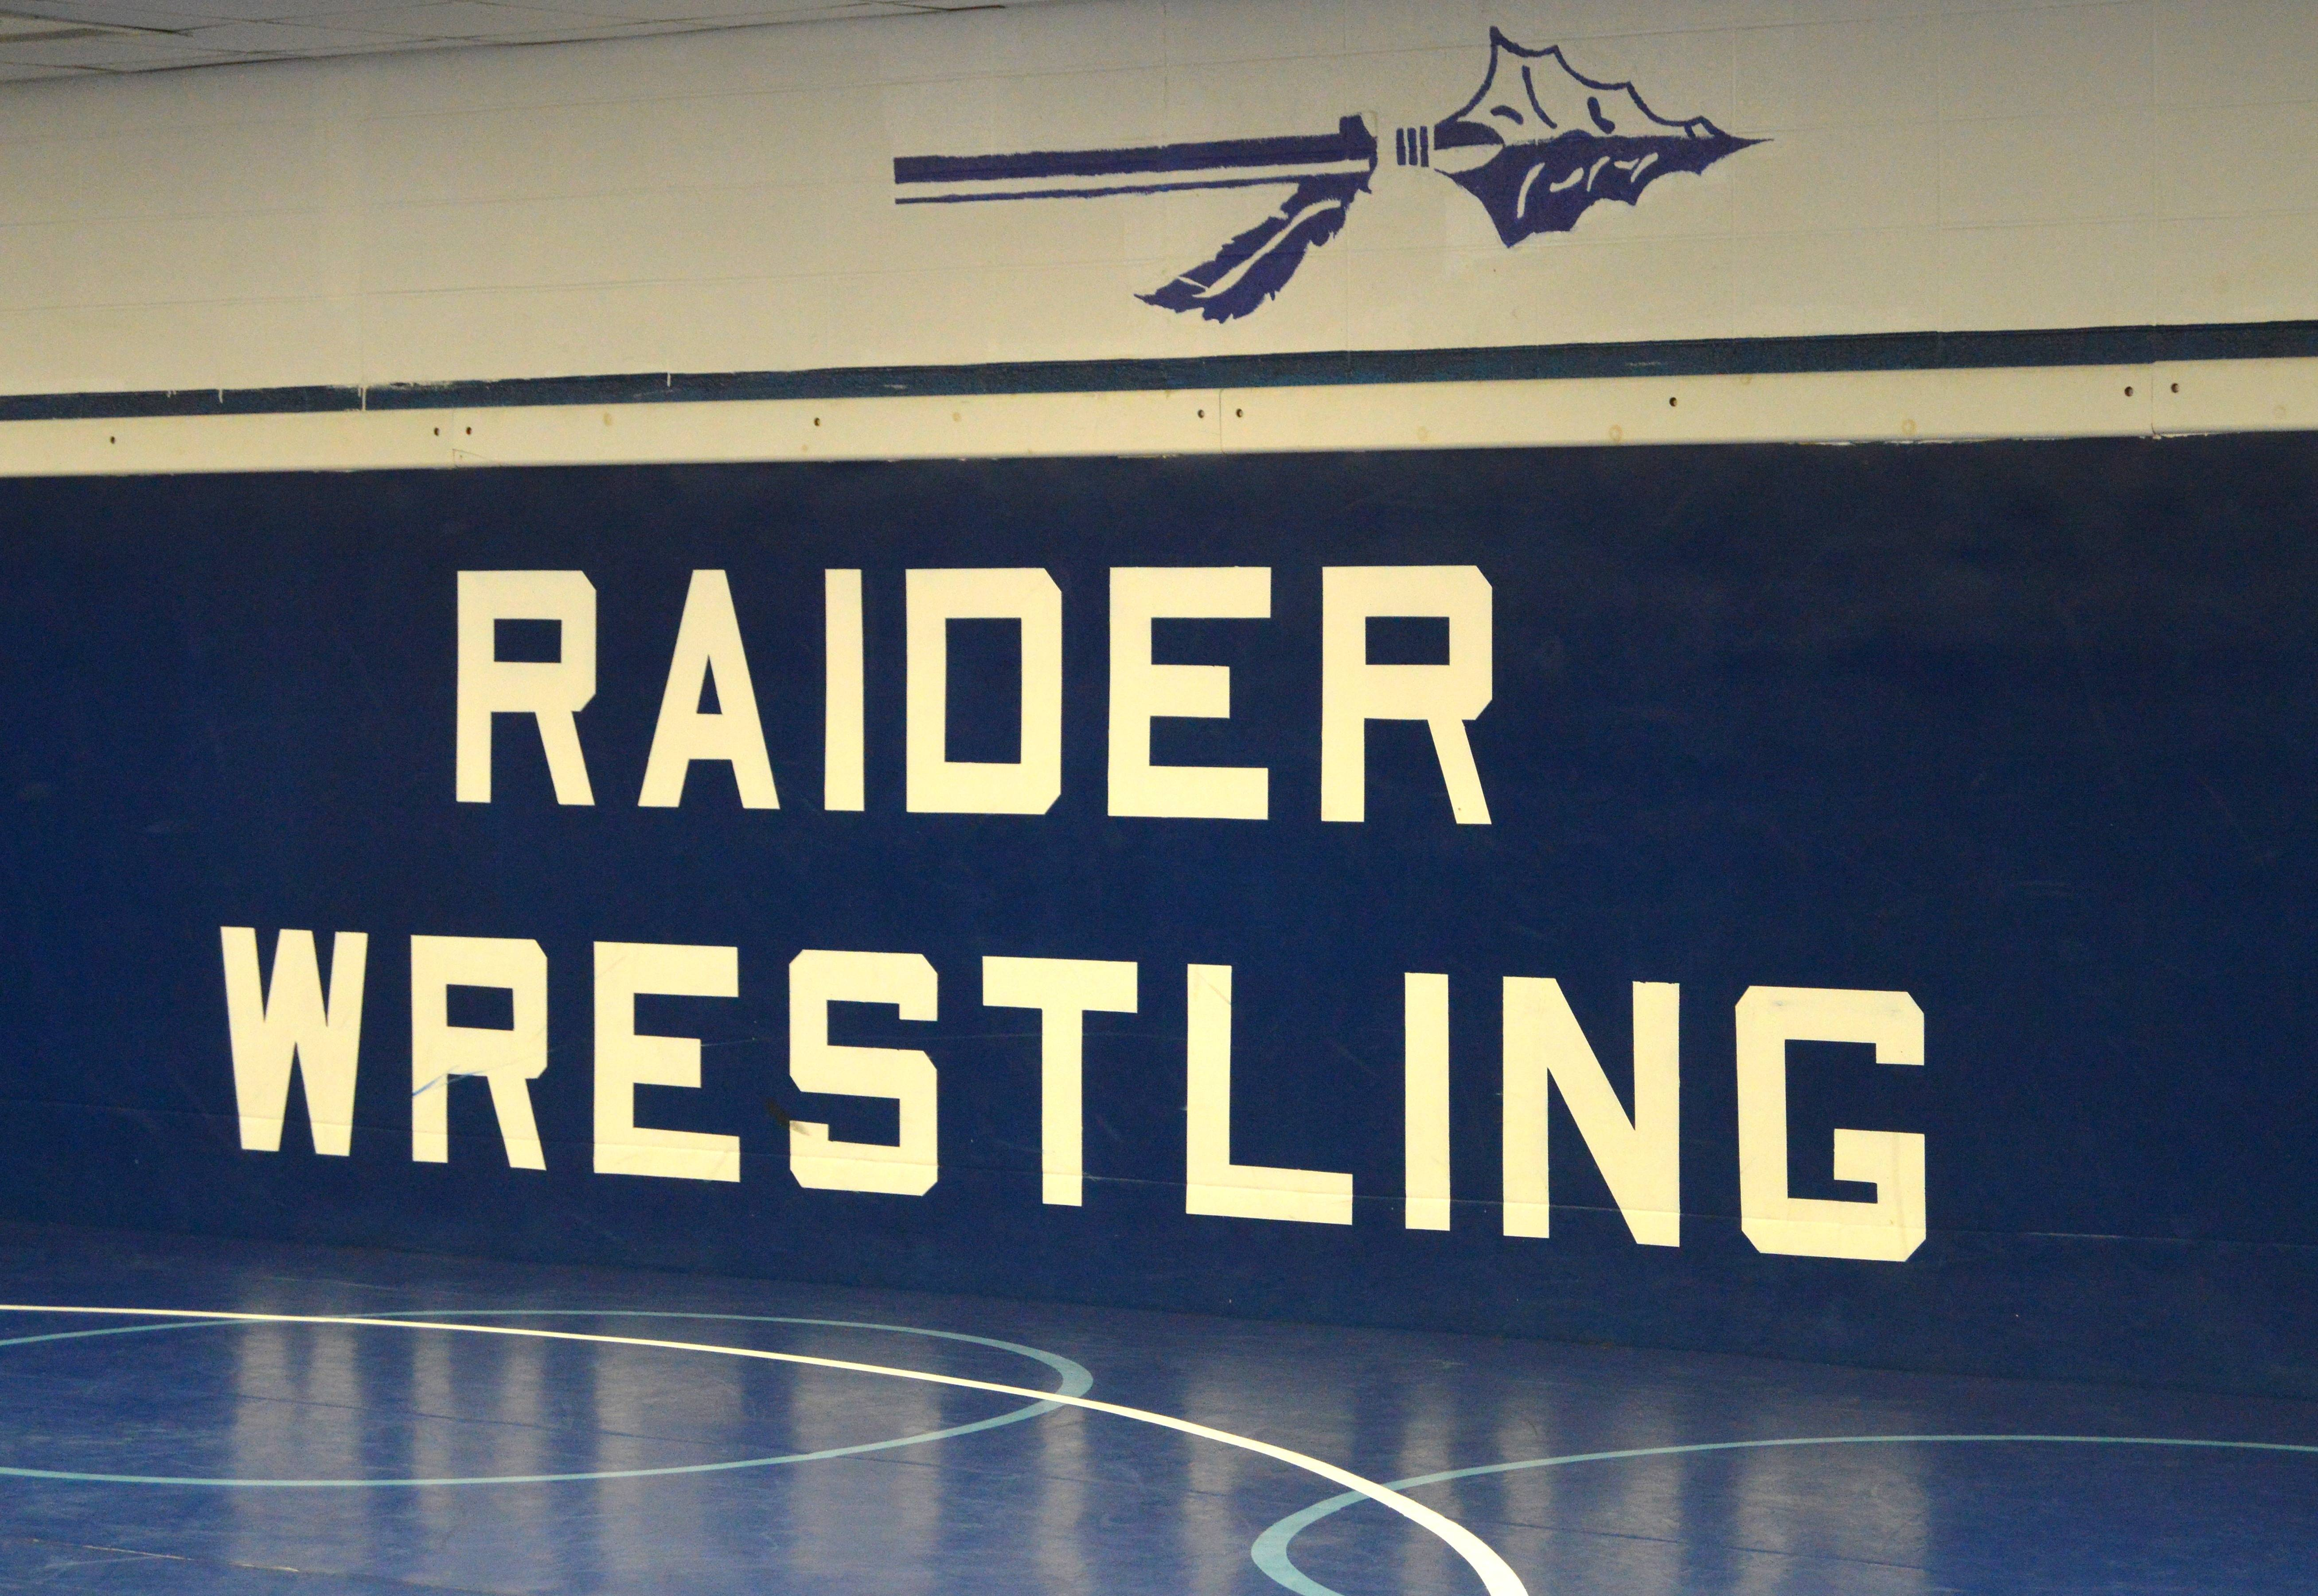 524f807121e5f91561d5_Raider_Wrestling_sign.JPG